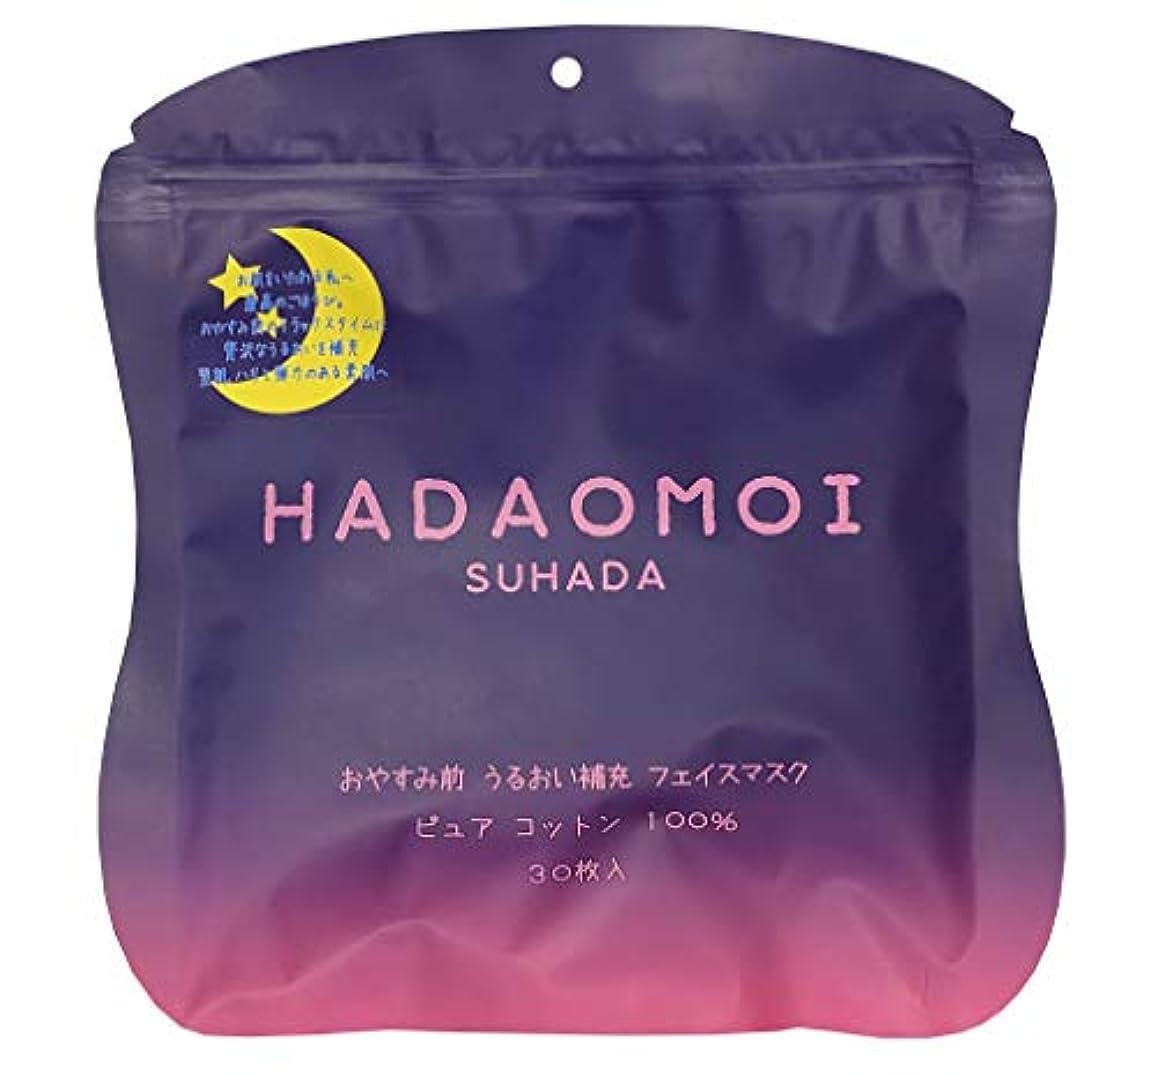 HADAOMOI(ハダオモイ) おやすみ前 うるおい補充 フェイスマスク 30枚入